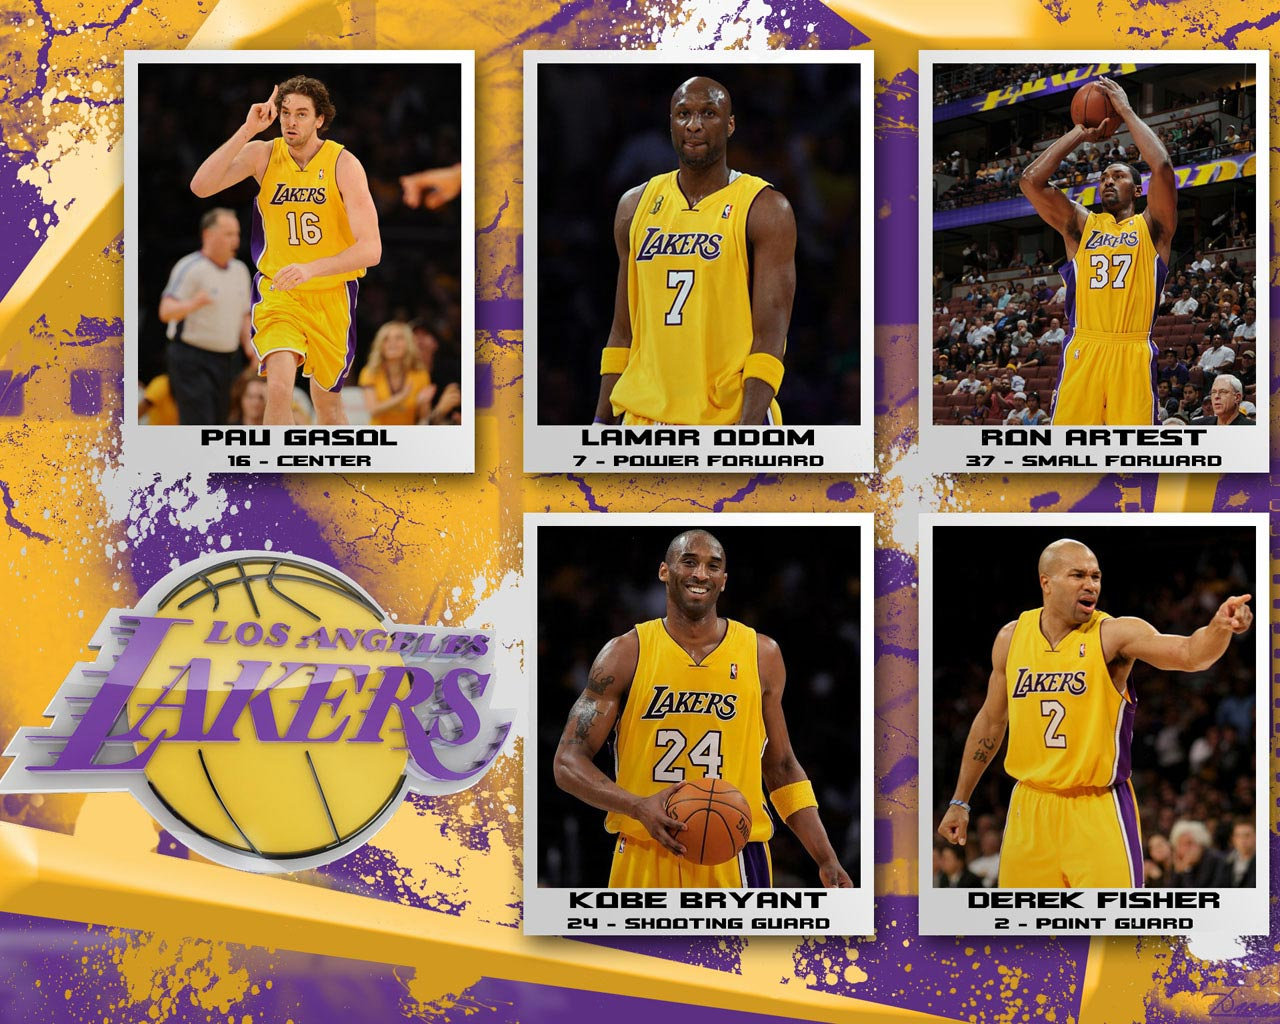 http://1.bp.blogspot.com/_MonPjEPeloY/S-PHxsphkoI/AAAAAAAAAA4/pqTFHqqP8ps/s1600/LA-Lakers-2010-Wallpaper.jpg